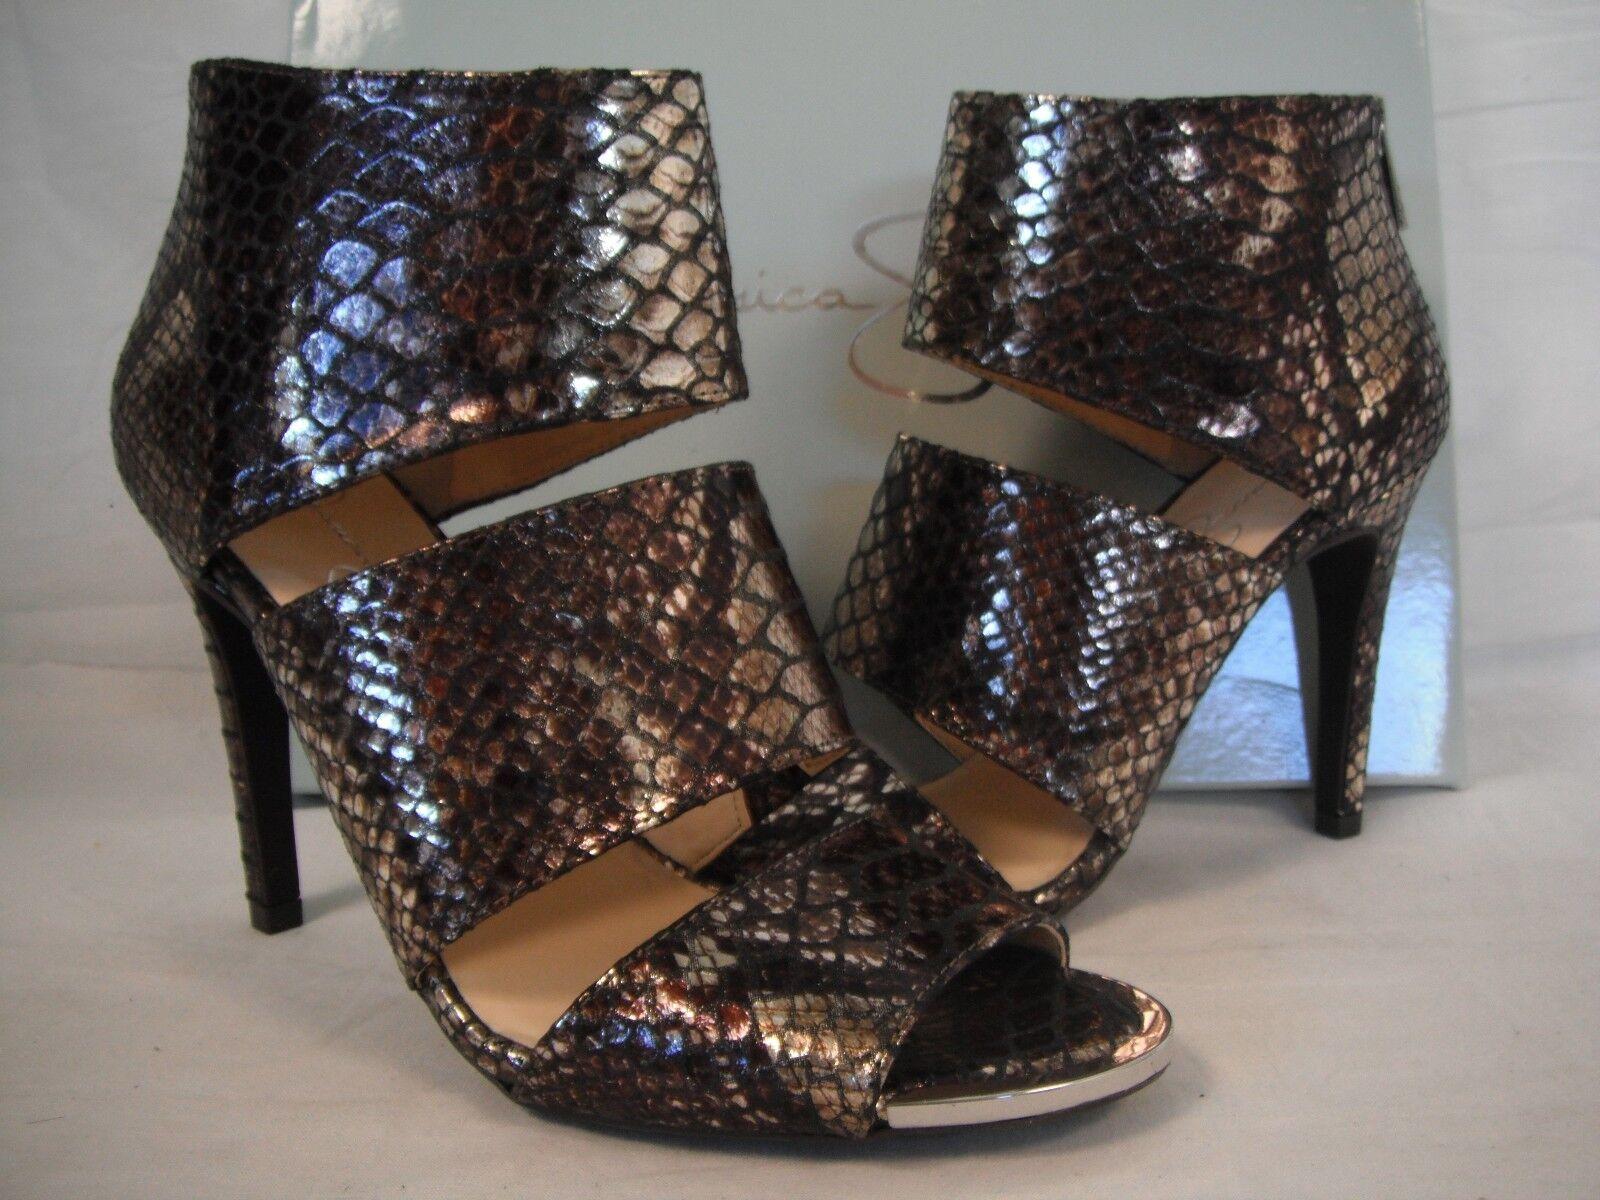 Jessica Simpson Größe 8 M Elsbeth Bronze Open Toe Heels New Damenschuhe Schuhes NWOB